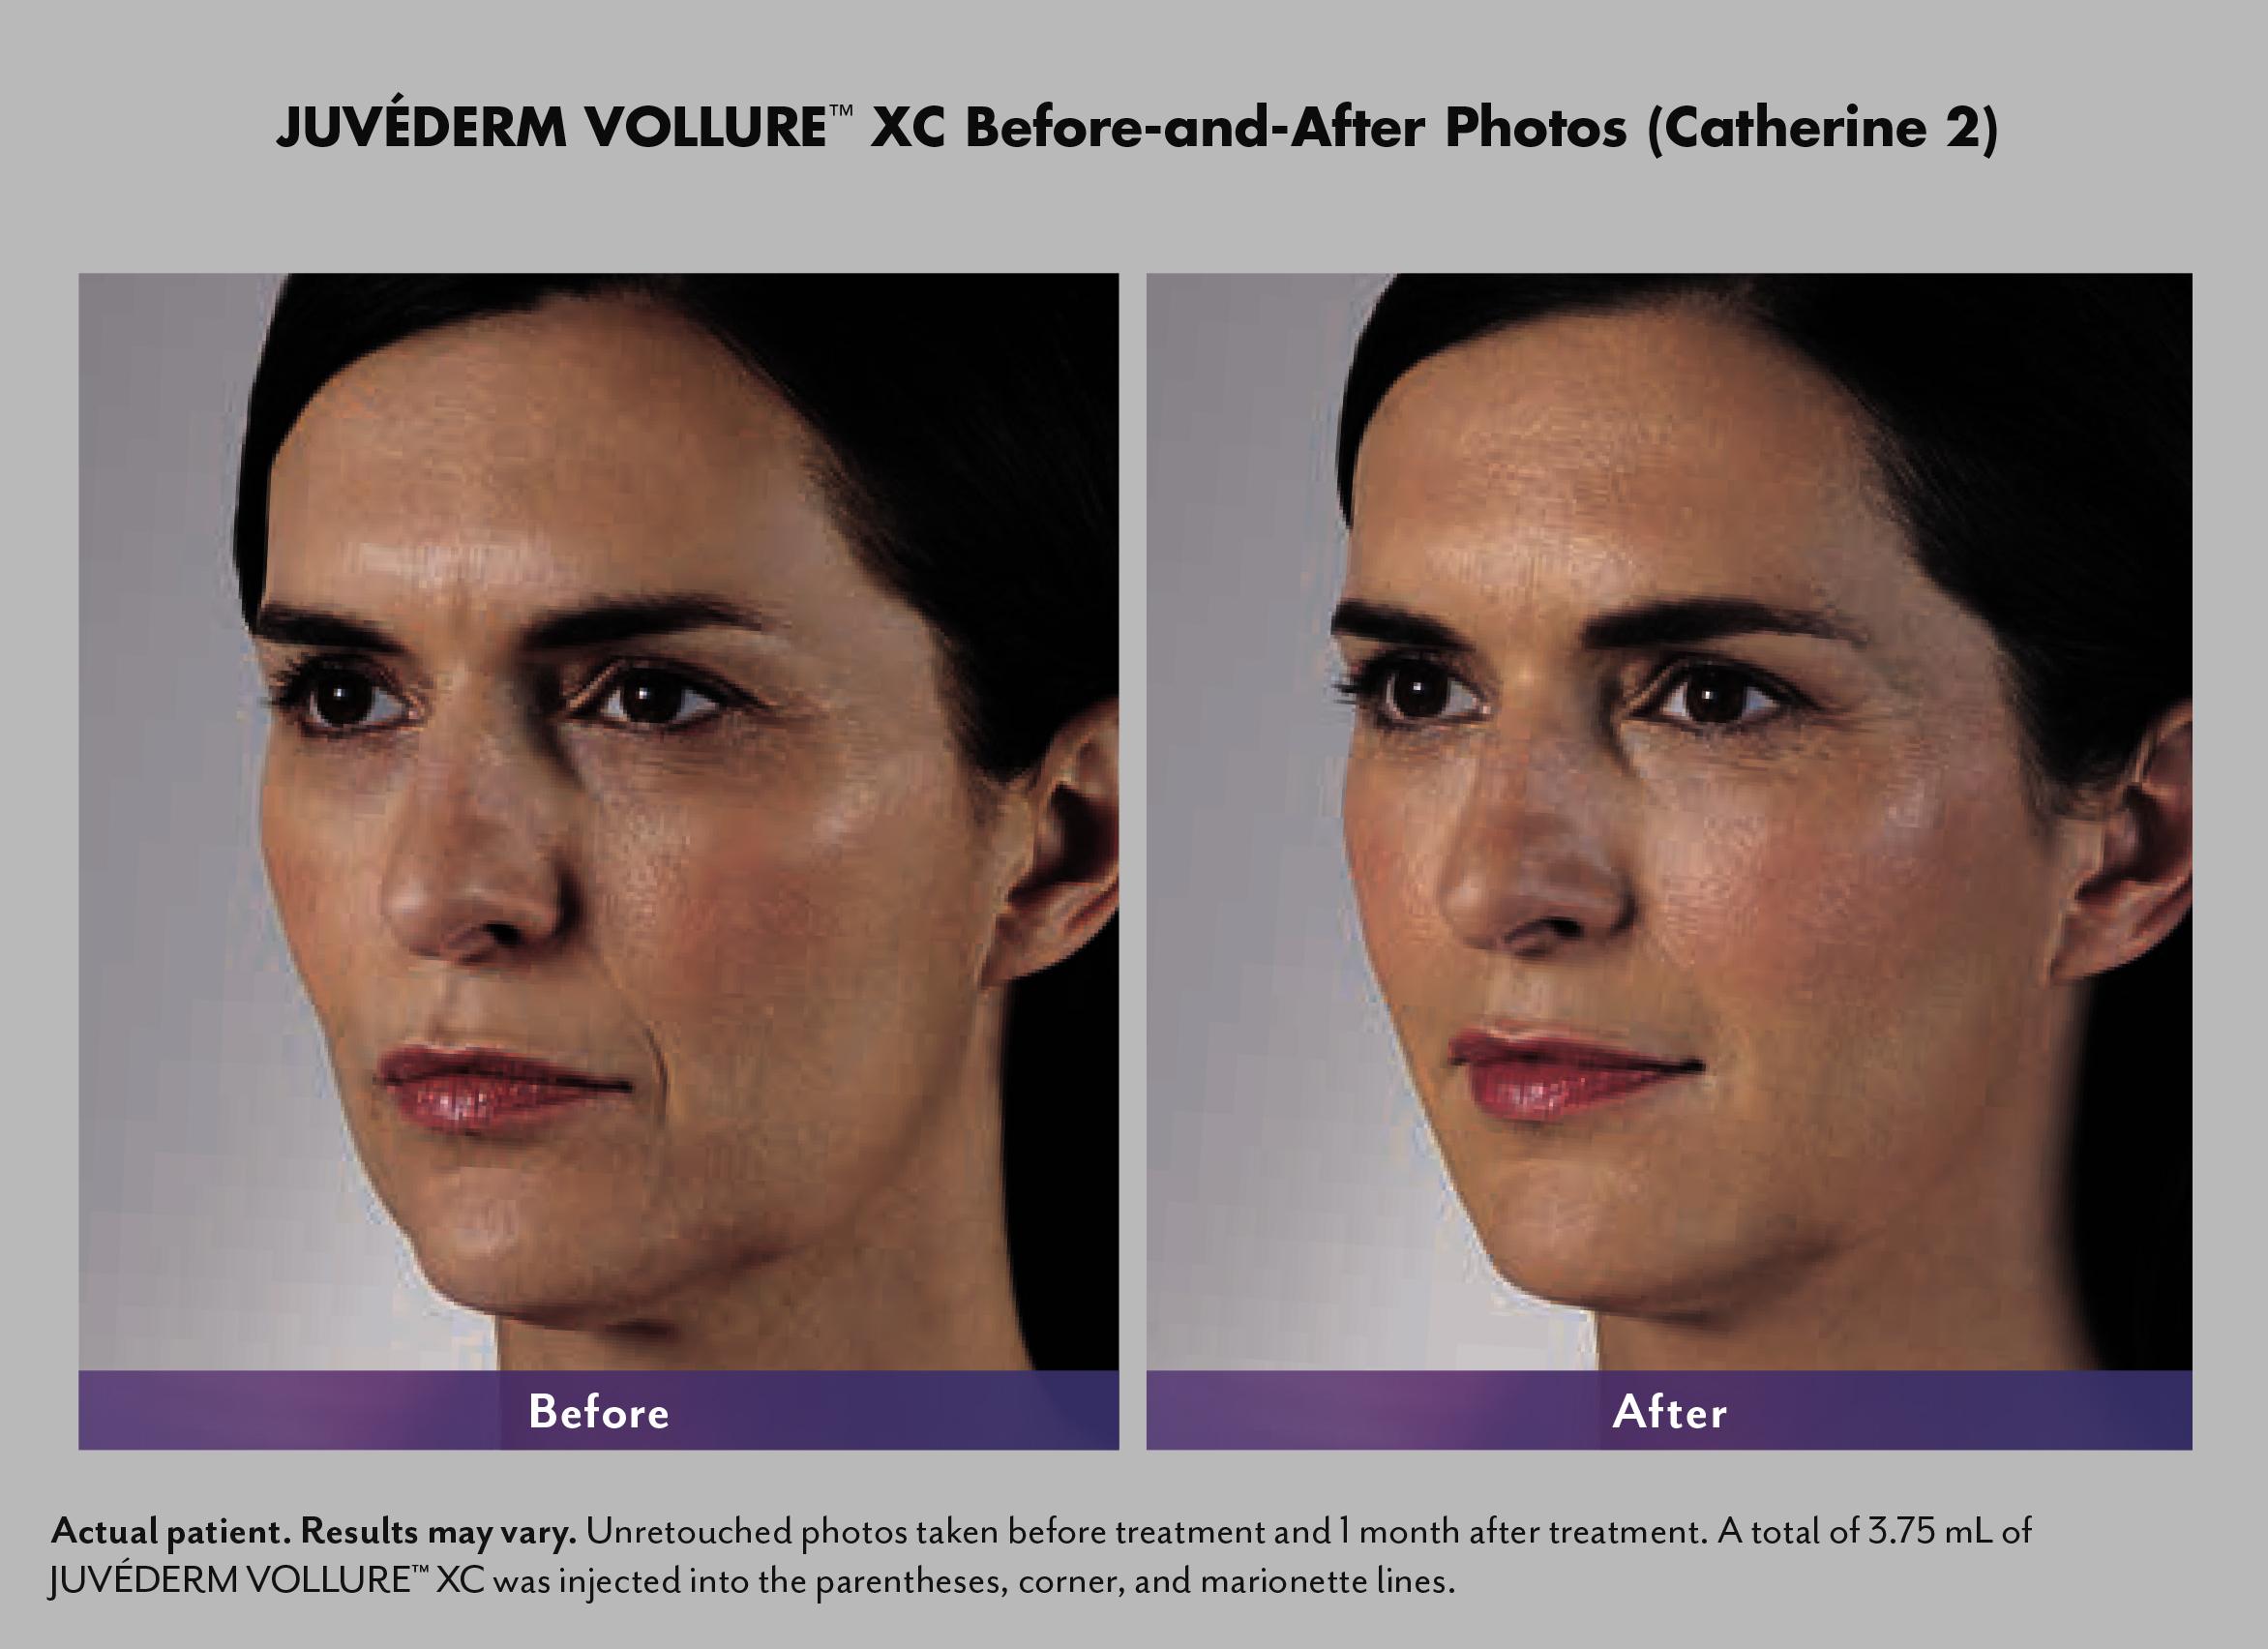 Juvederm Vollure XC - Deerfield Dermatology